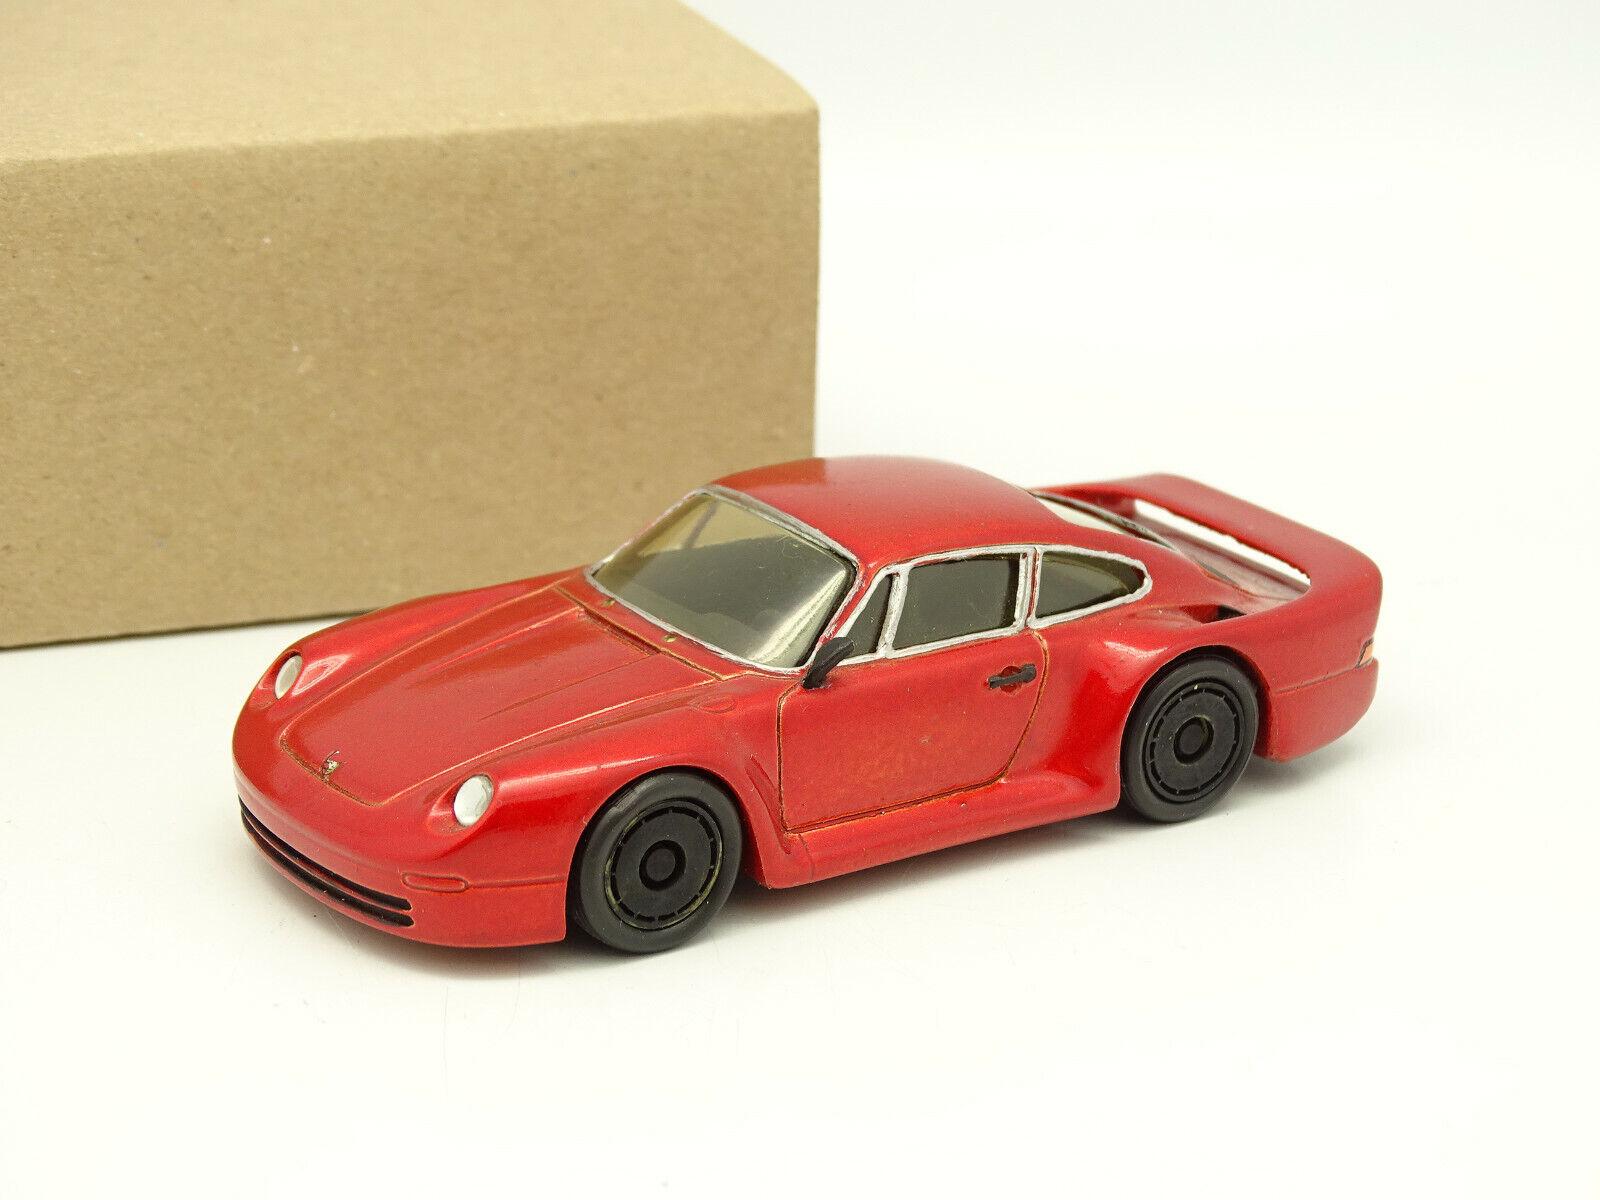 Provence Moldura Kit Montado Resina 1 43 - Porsche 911 959 Grupo B Rojo